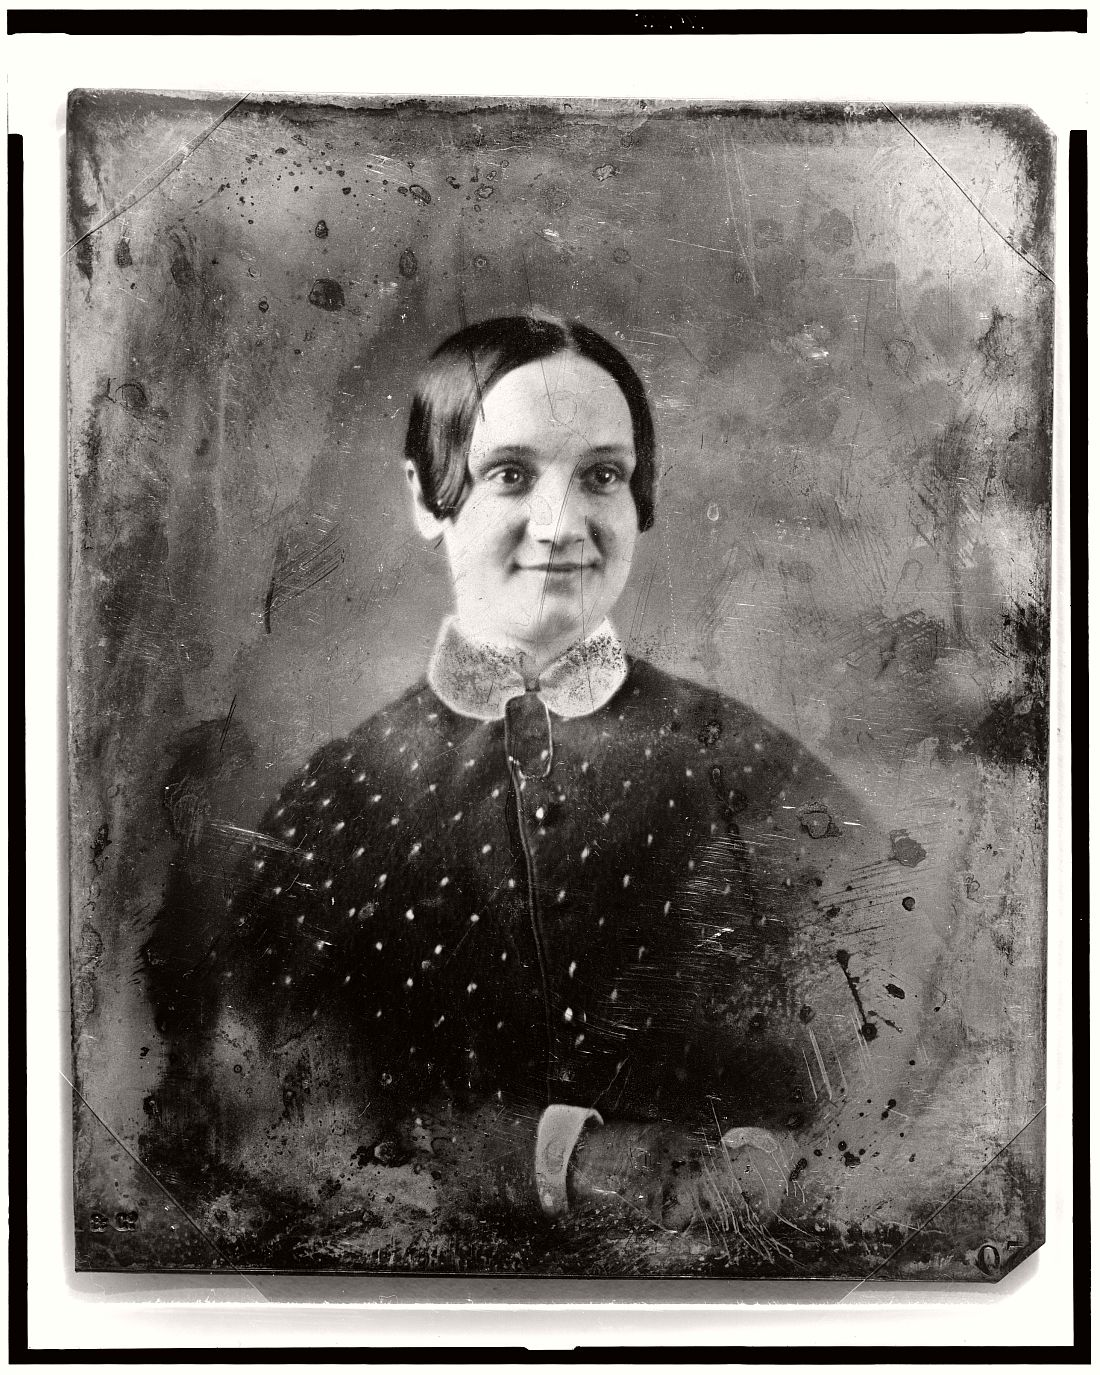 vintage-daguerreotype-portraits-from-xix-century-1844-1860-58